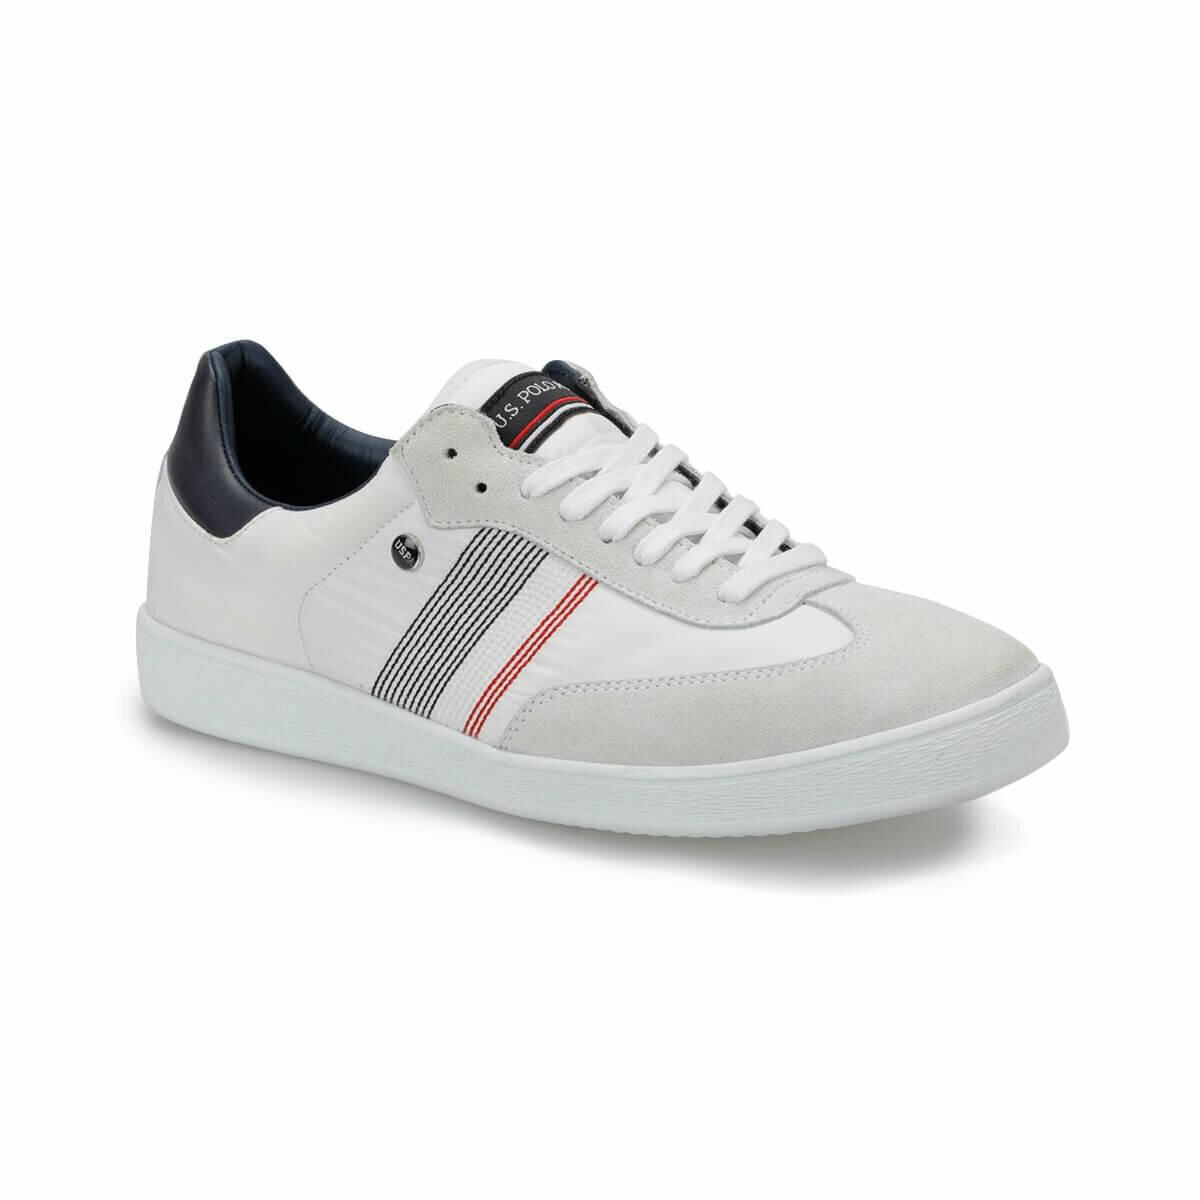 FLO NATIVE White Male Shoes U.S. POLO ASSN.